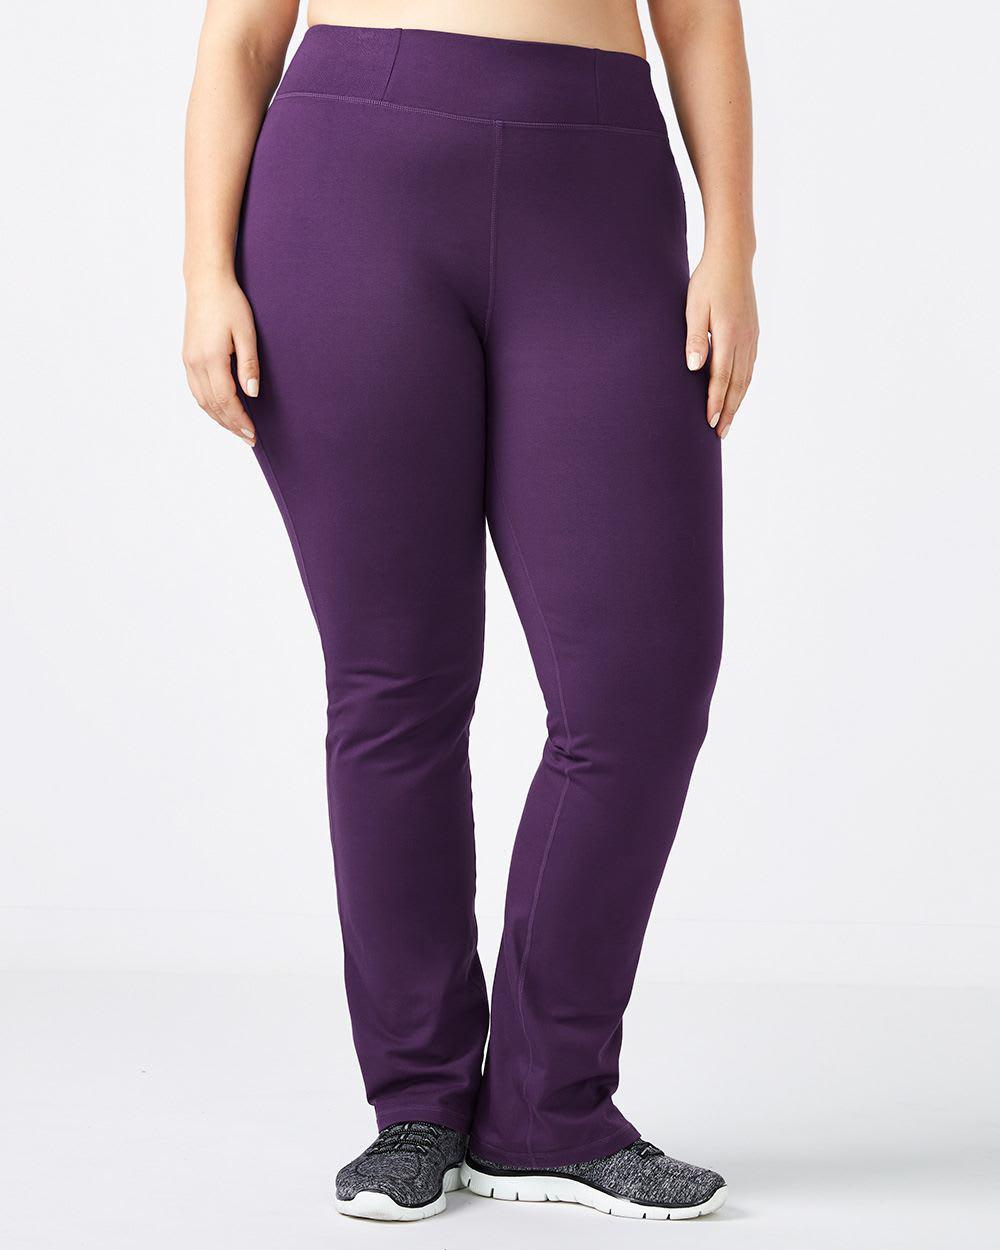 892ac8bbd01 Lyst - Addition Elle Online Only - Plus-size Yoga Pant - Essentials ...